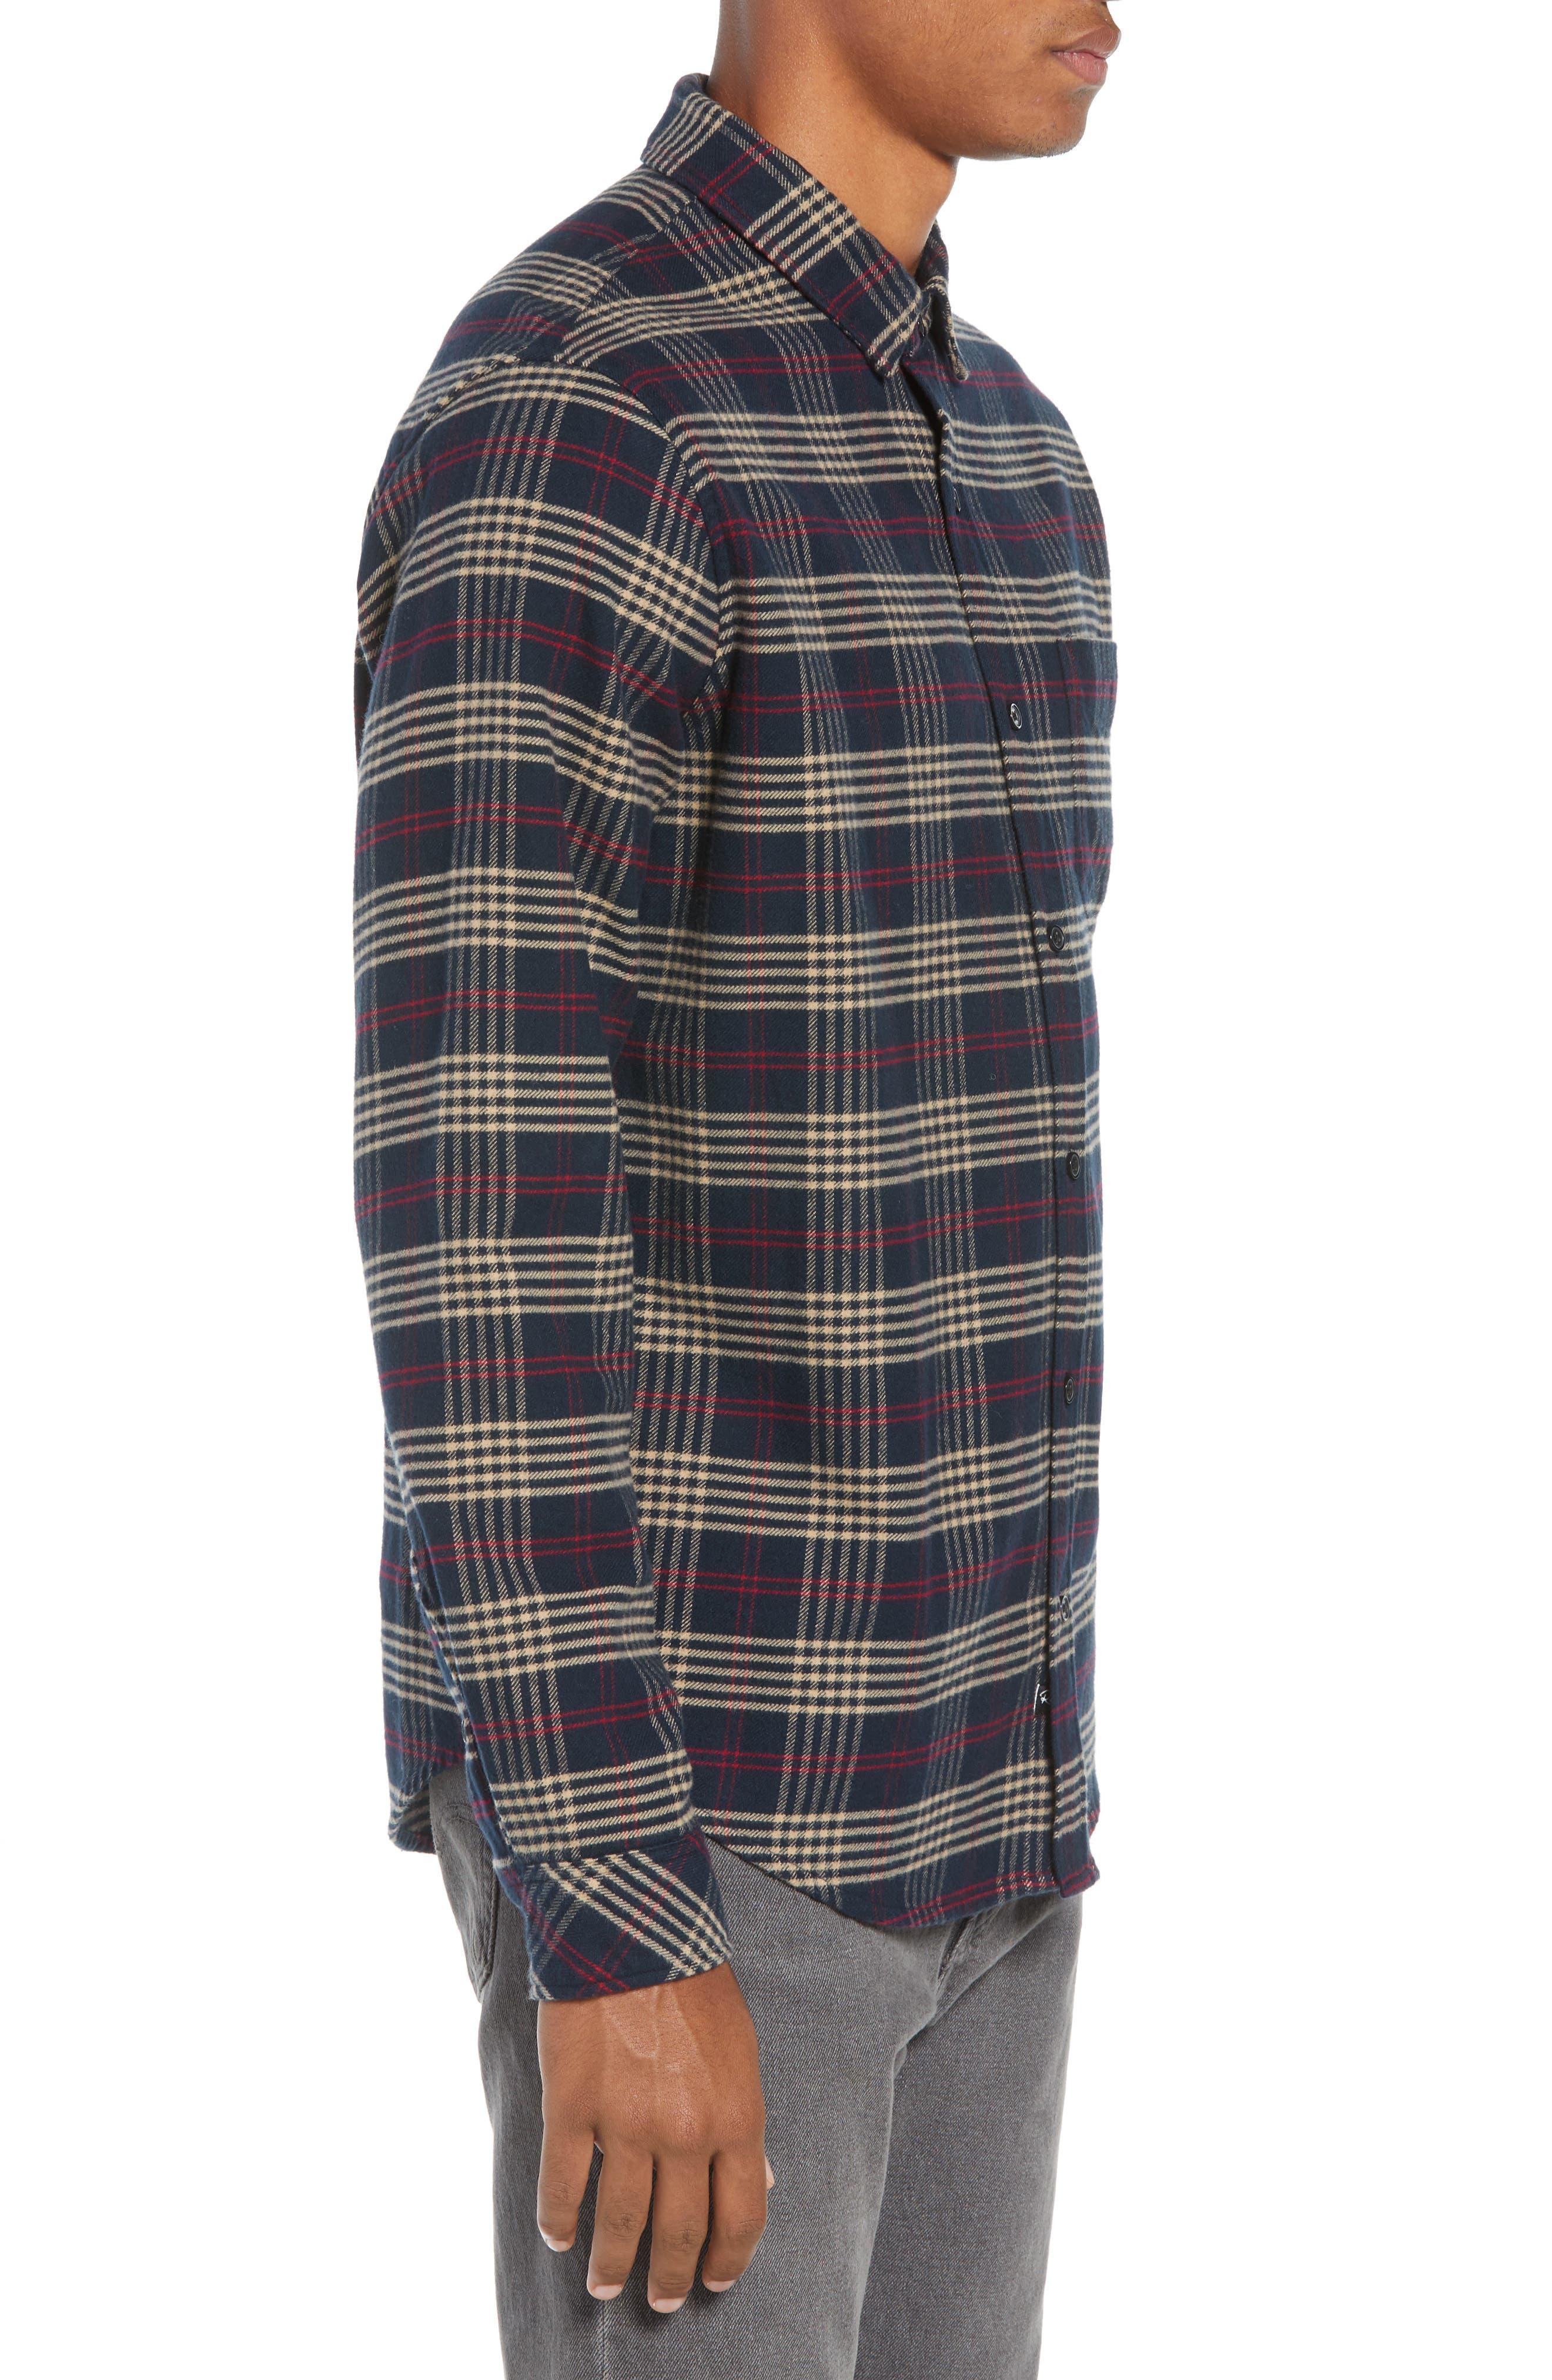 Forrest Slim Fit Plaid Flannel Sport Shirt,                             Alternate thumbnail 4, color,                             NAVY/RED/ELM